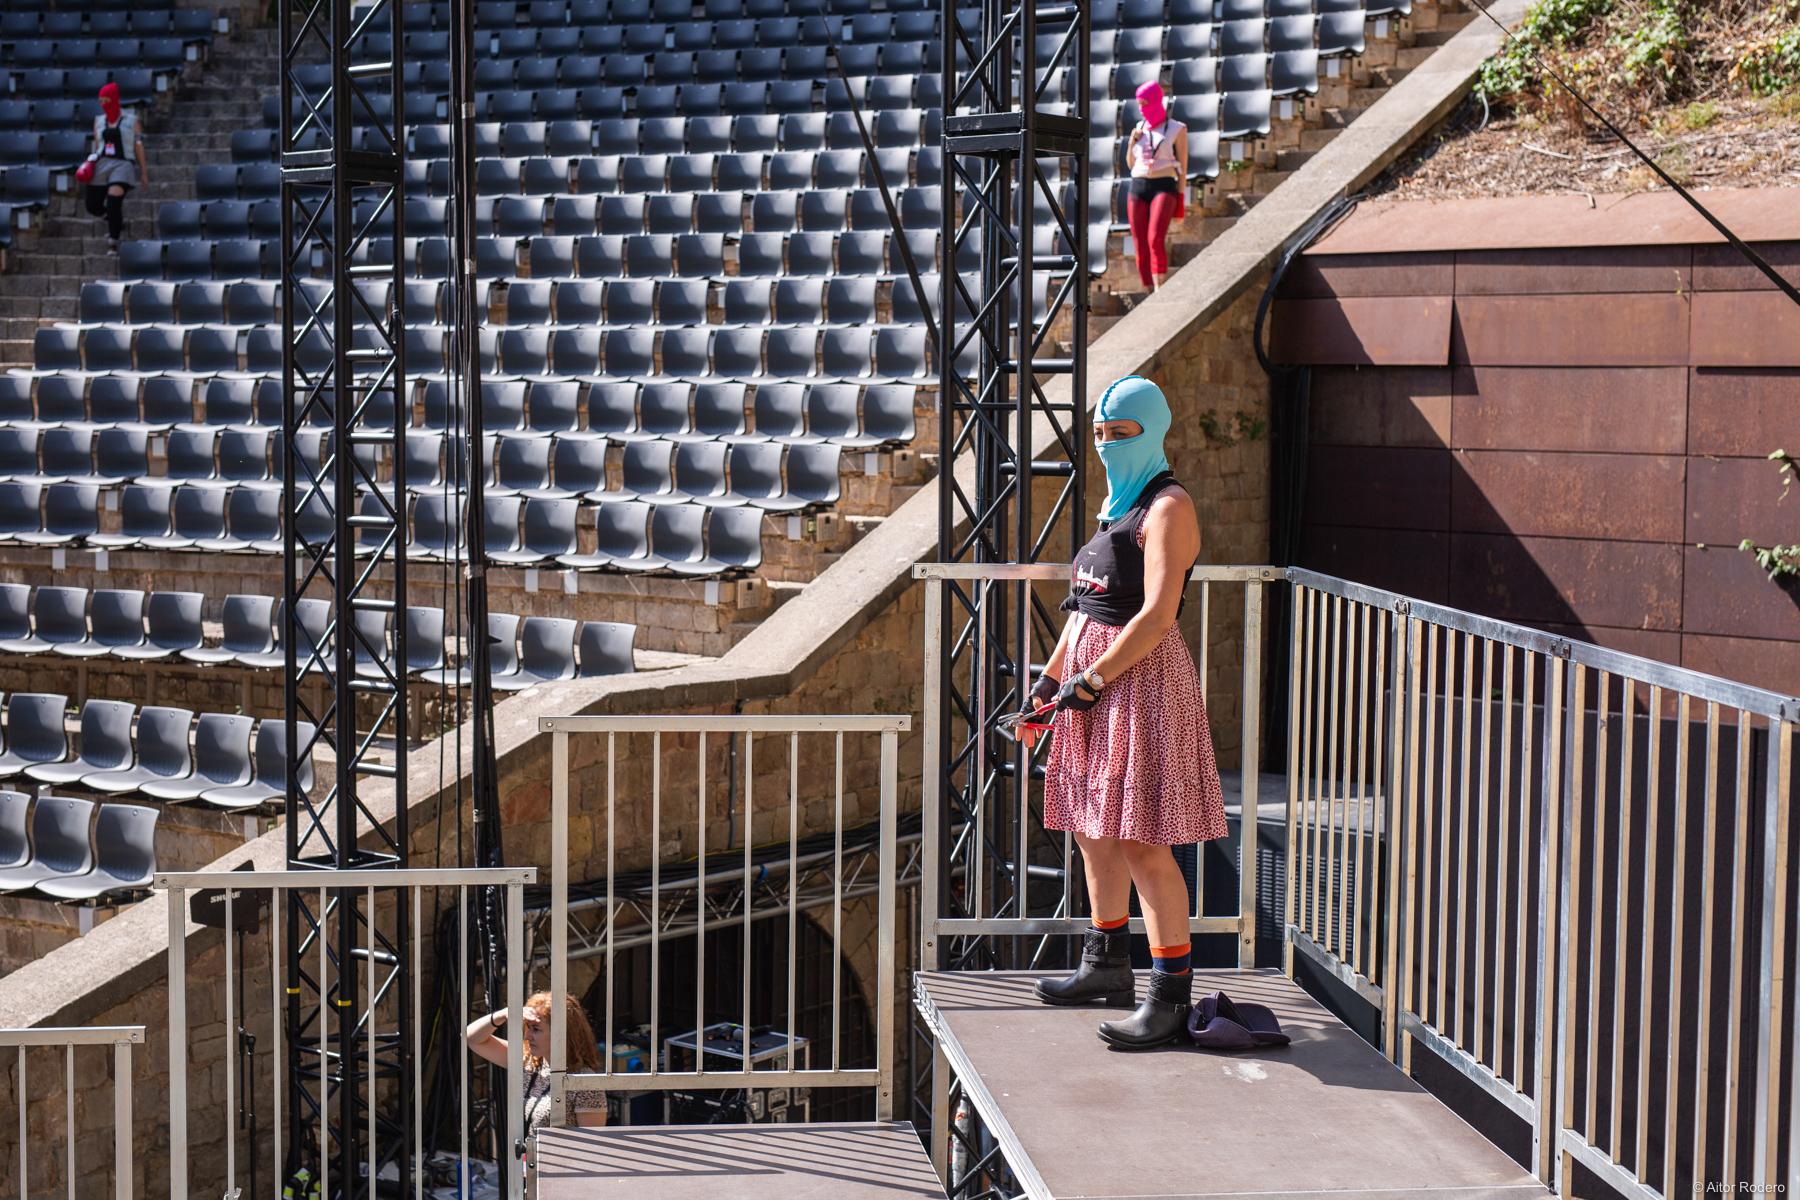 Parking Shakespeare clausura el GREC